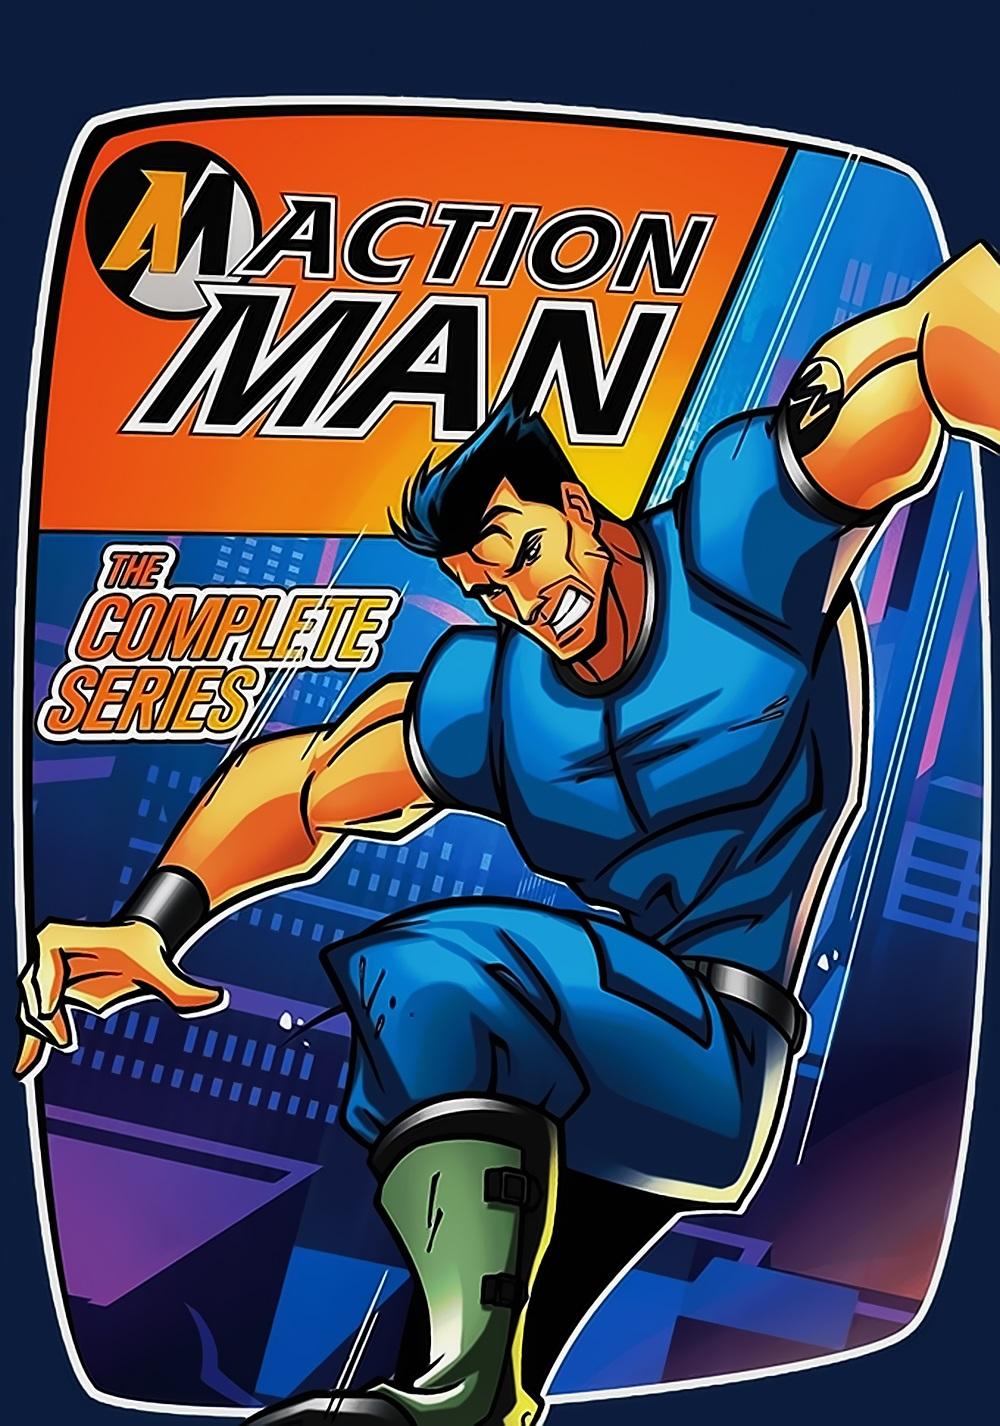 Action Man (1995 TV Series)